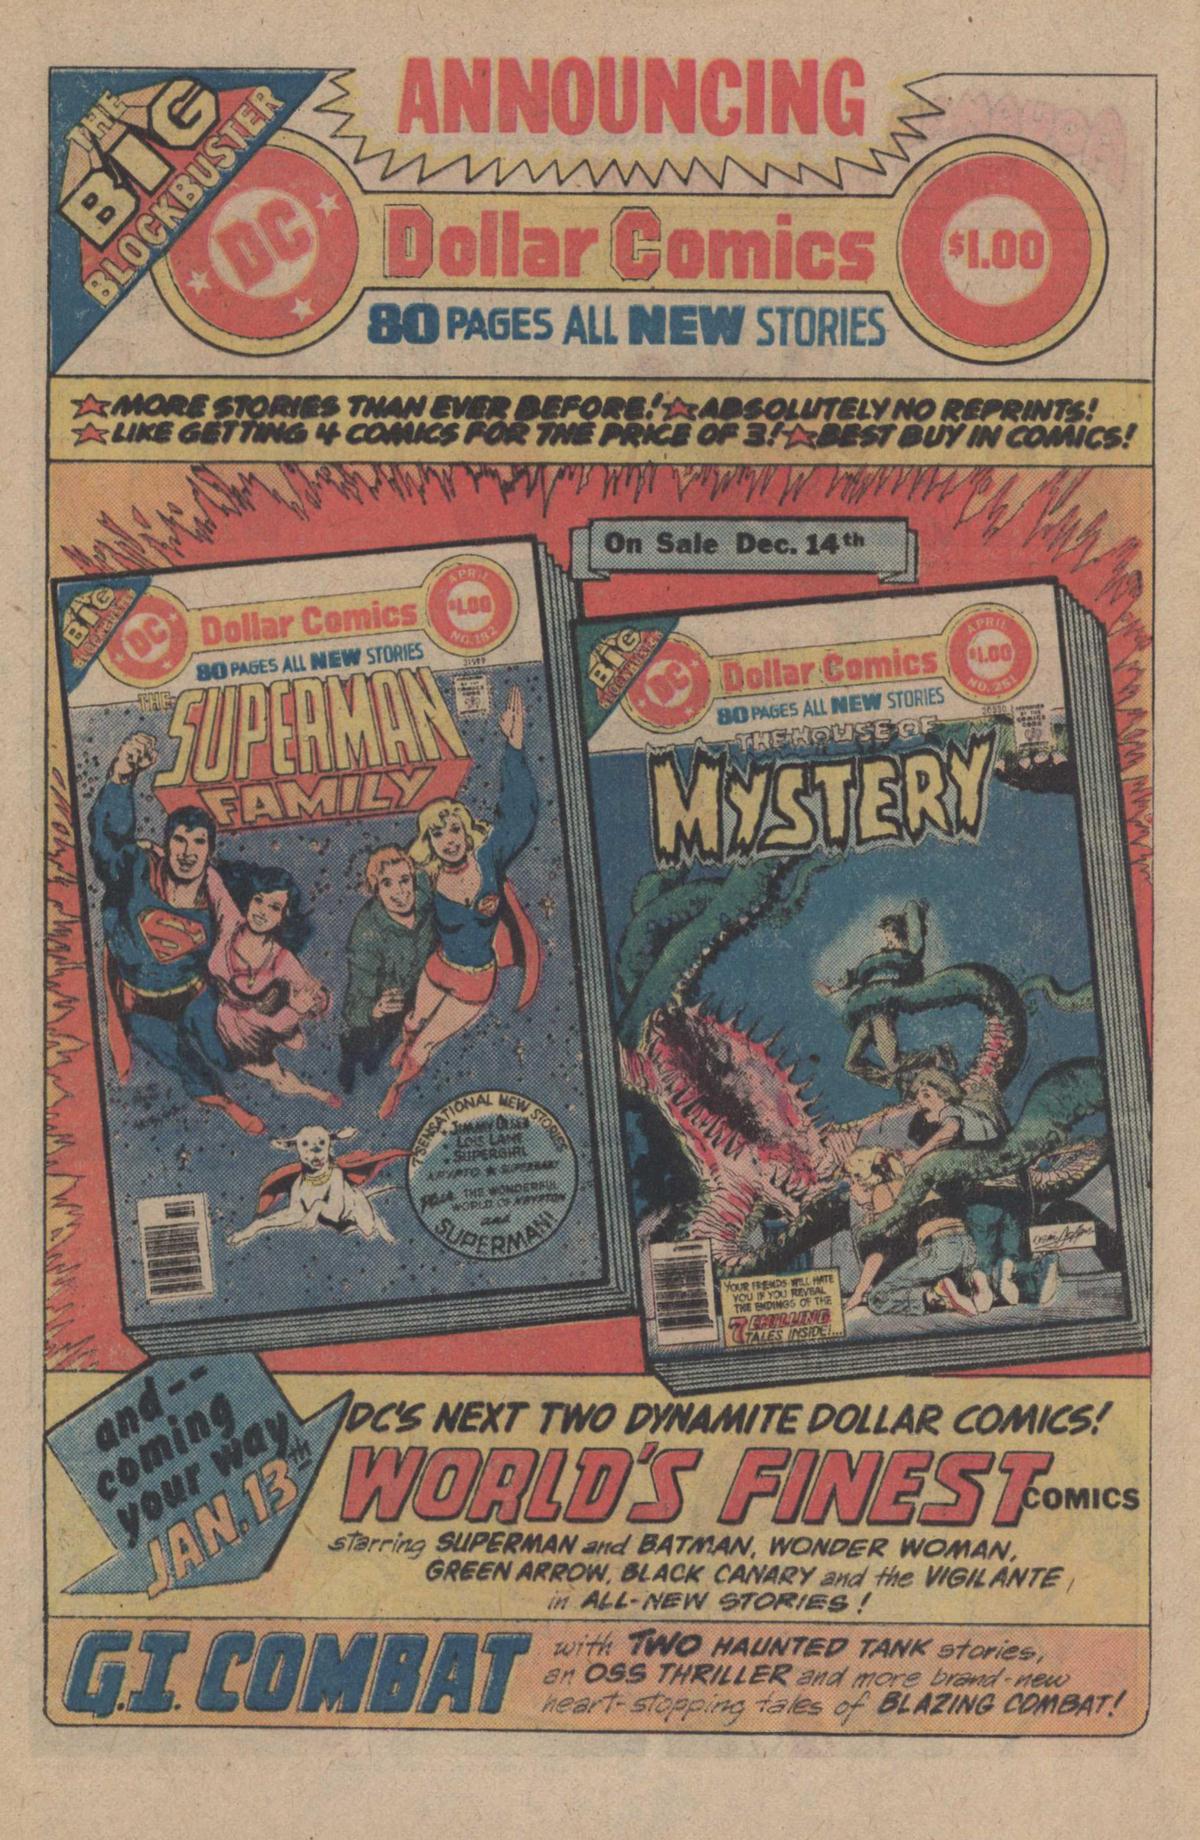 Read online All-Star Comics comic -  Issue #65 - 8